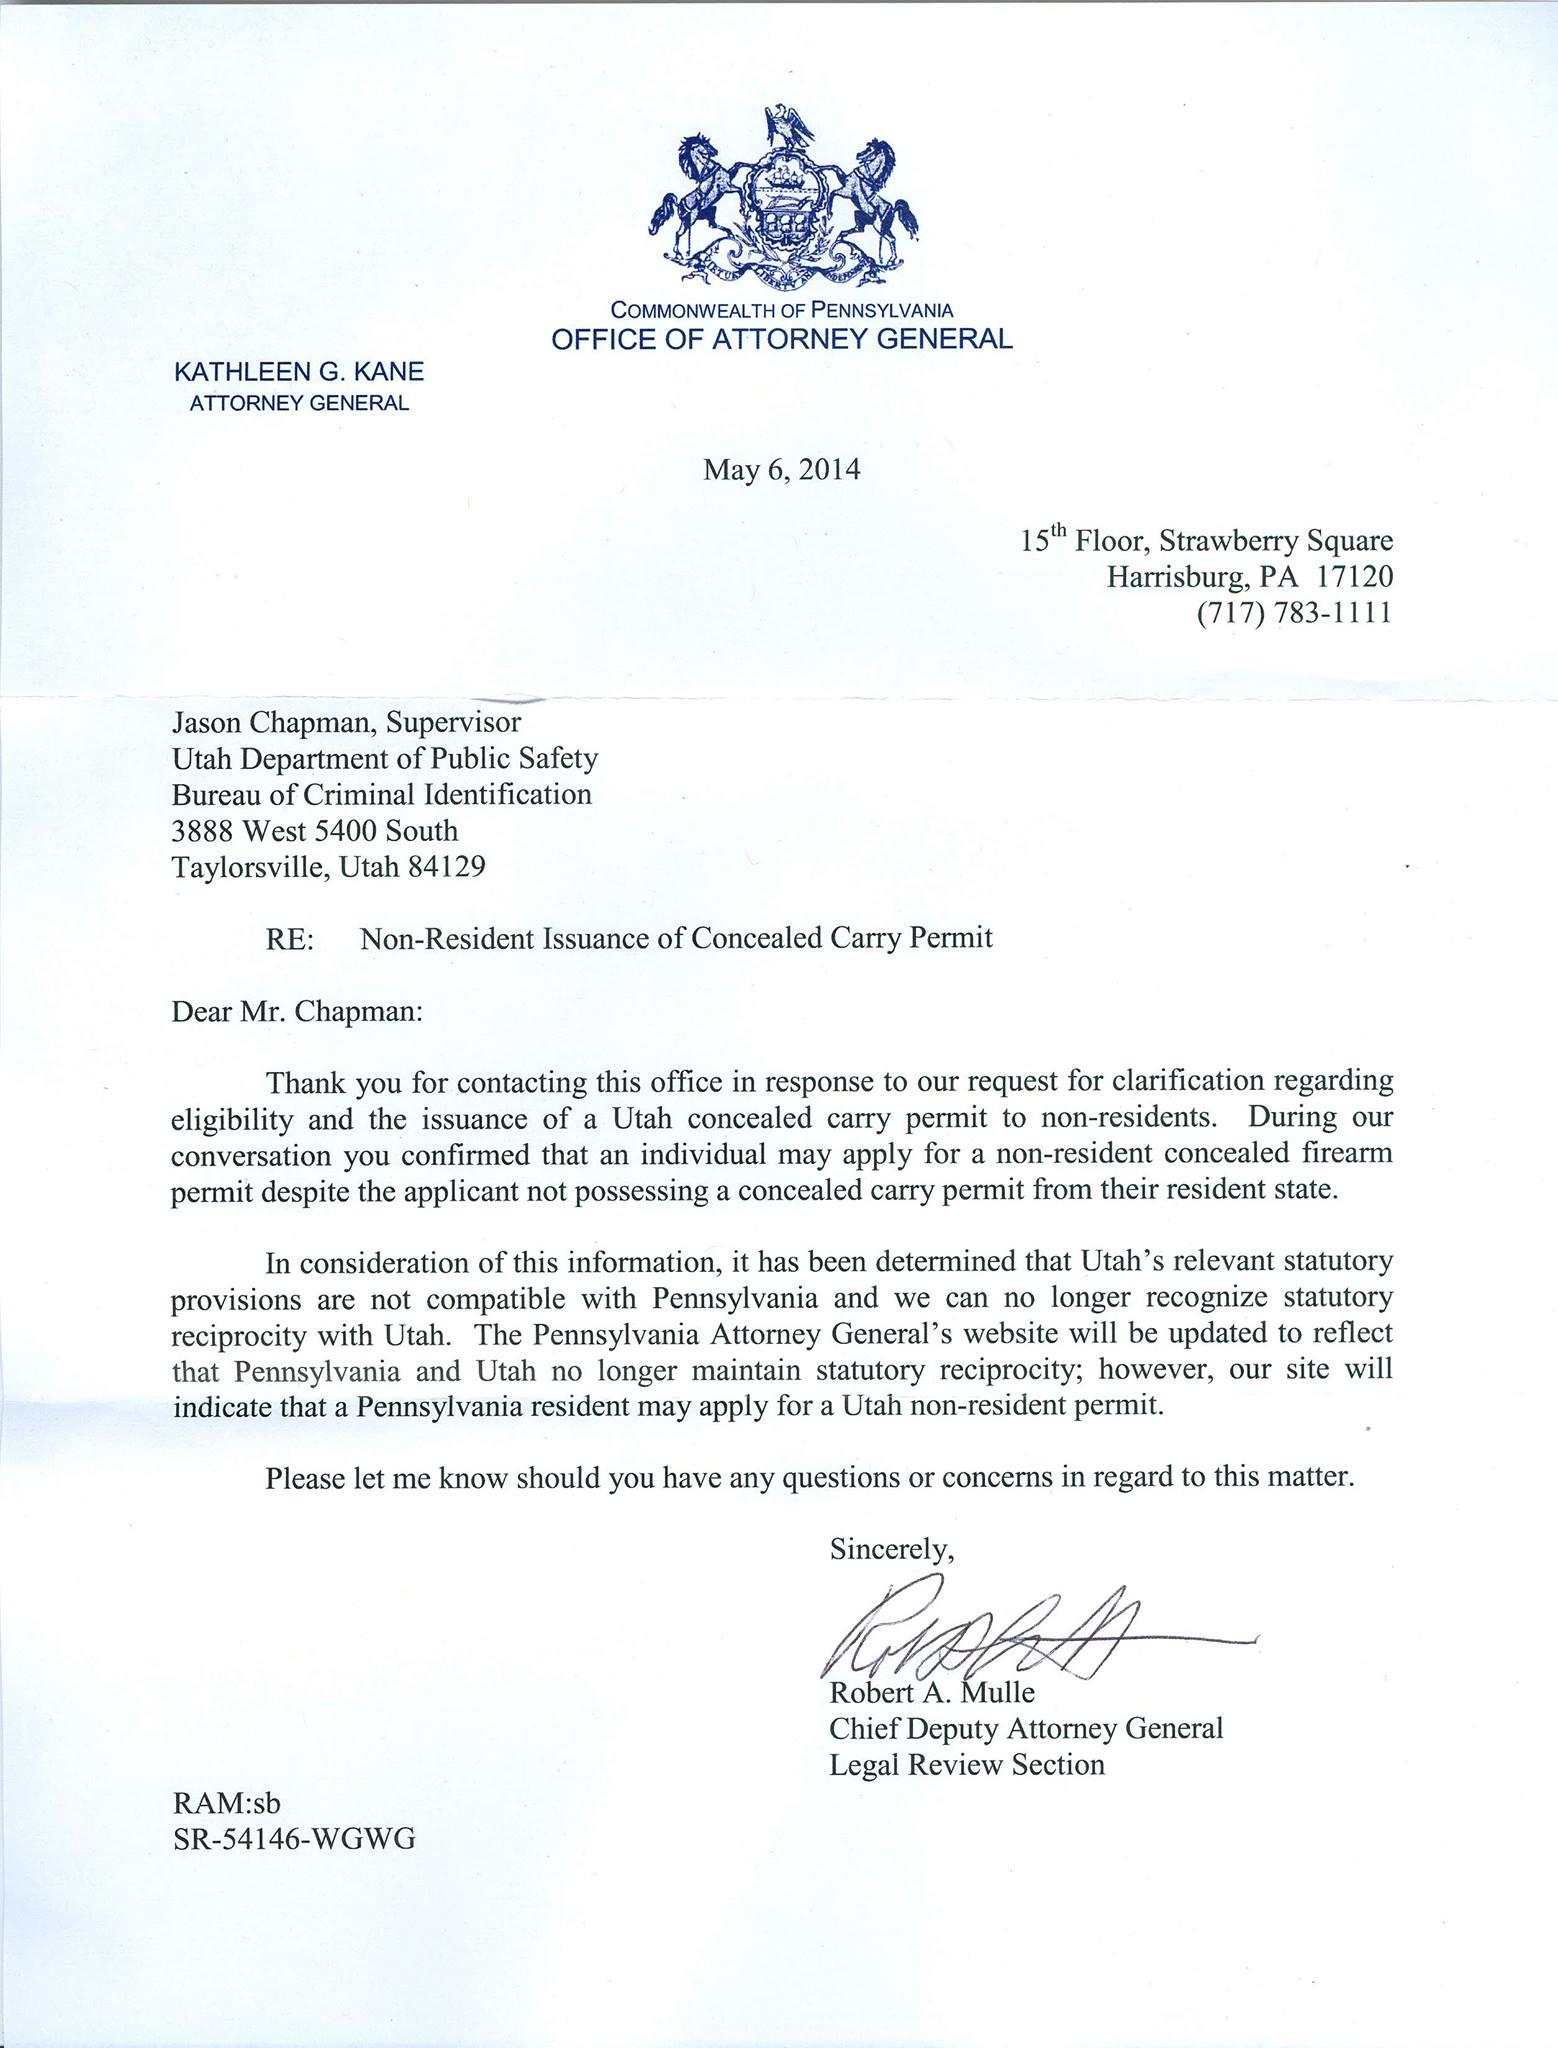 pistol permit letter of recommendation